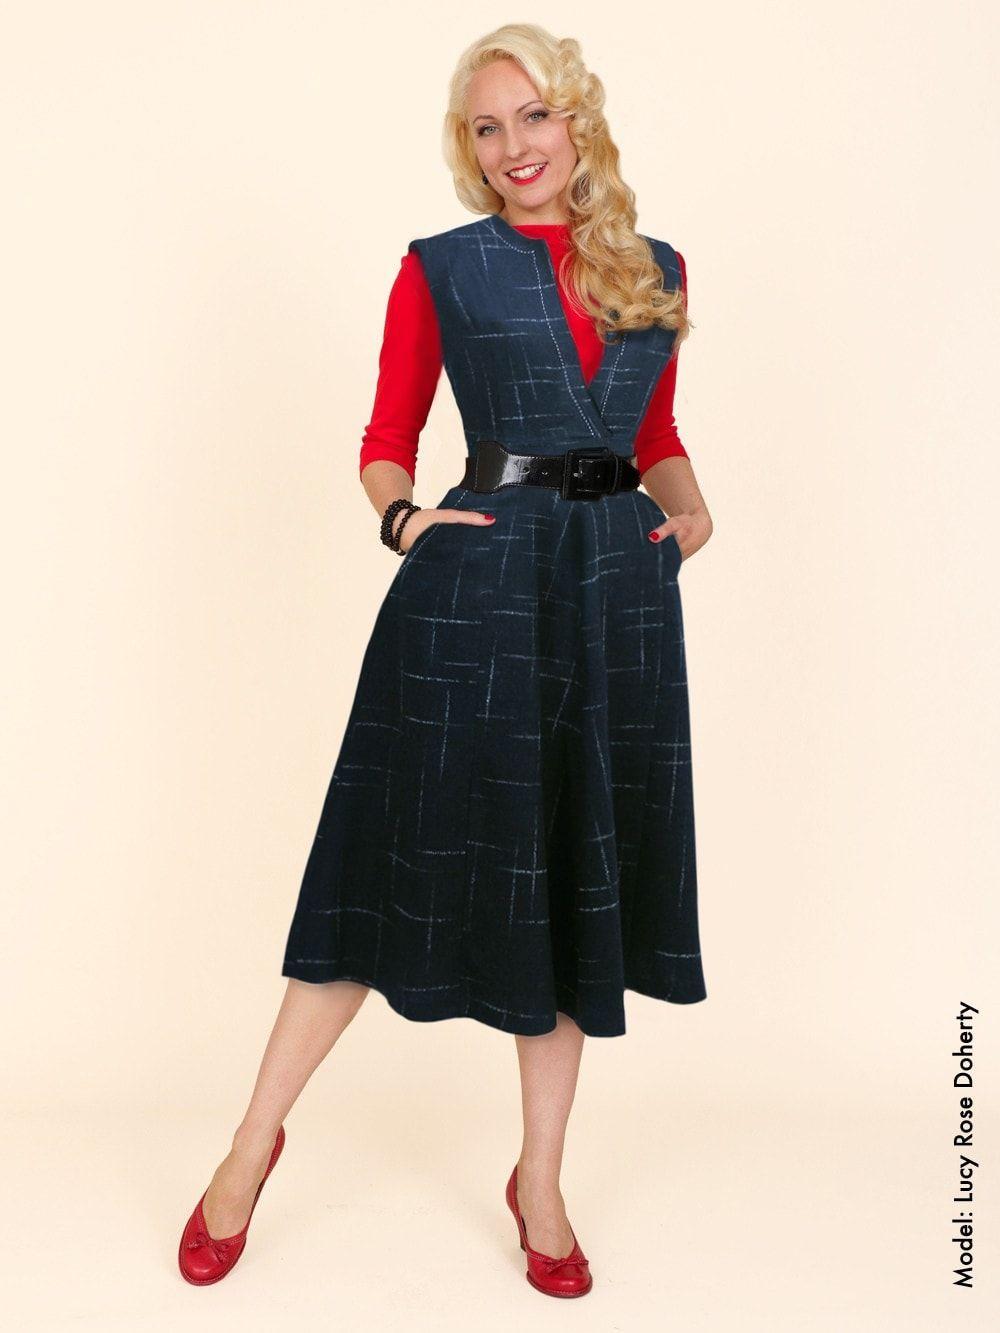 Flannel outfits for women  ssVivienofHollowayBestVintageStyleReproductionLaura